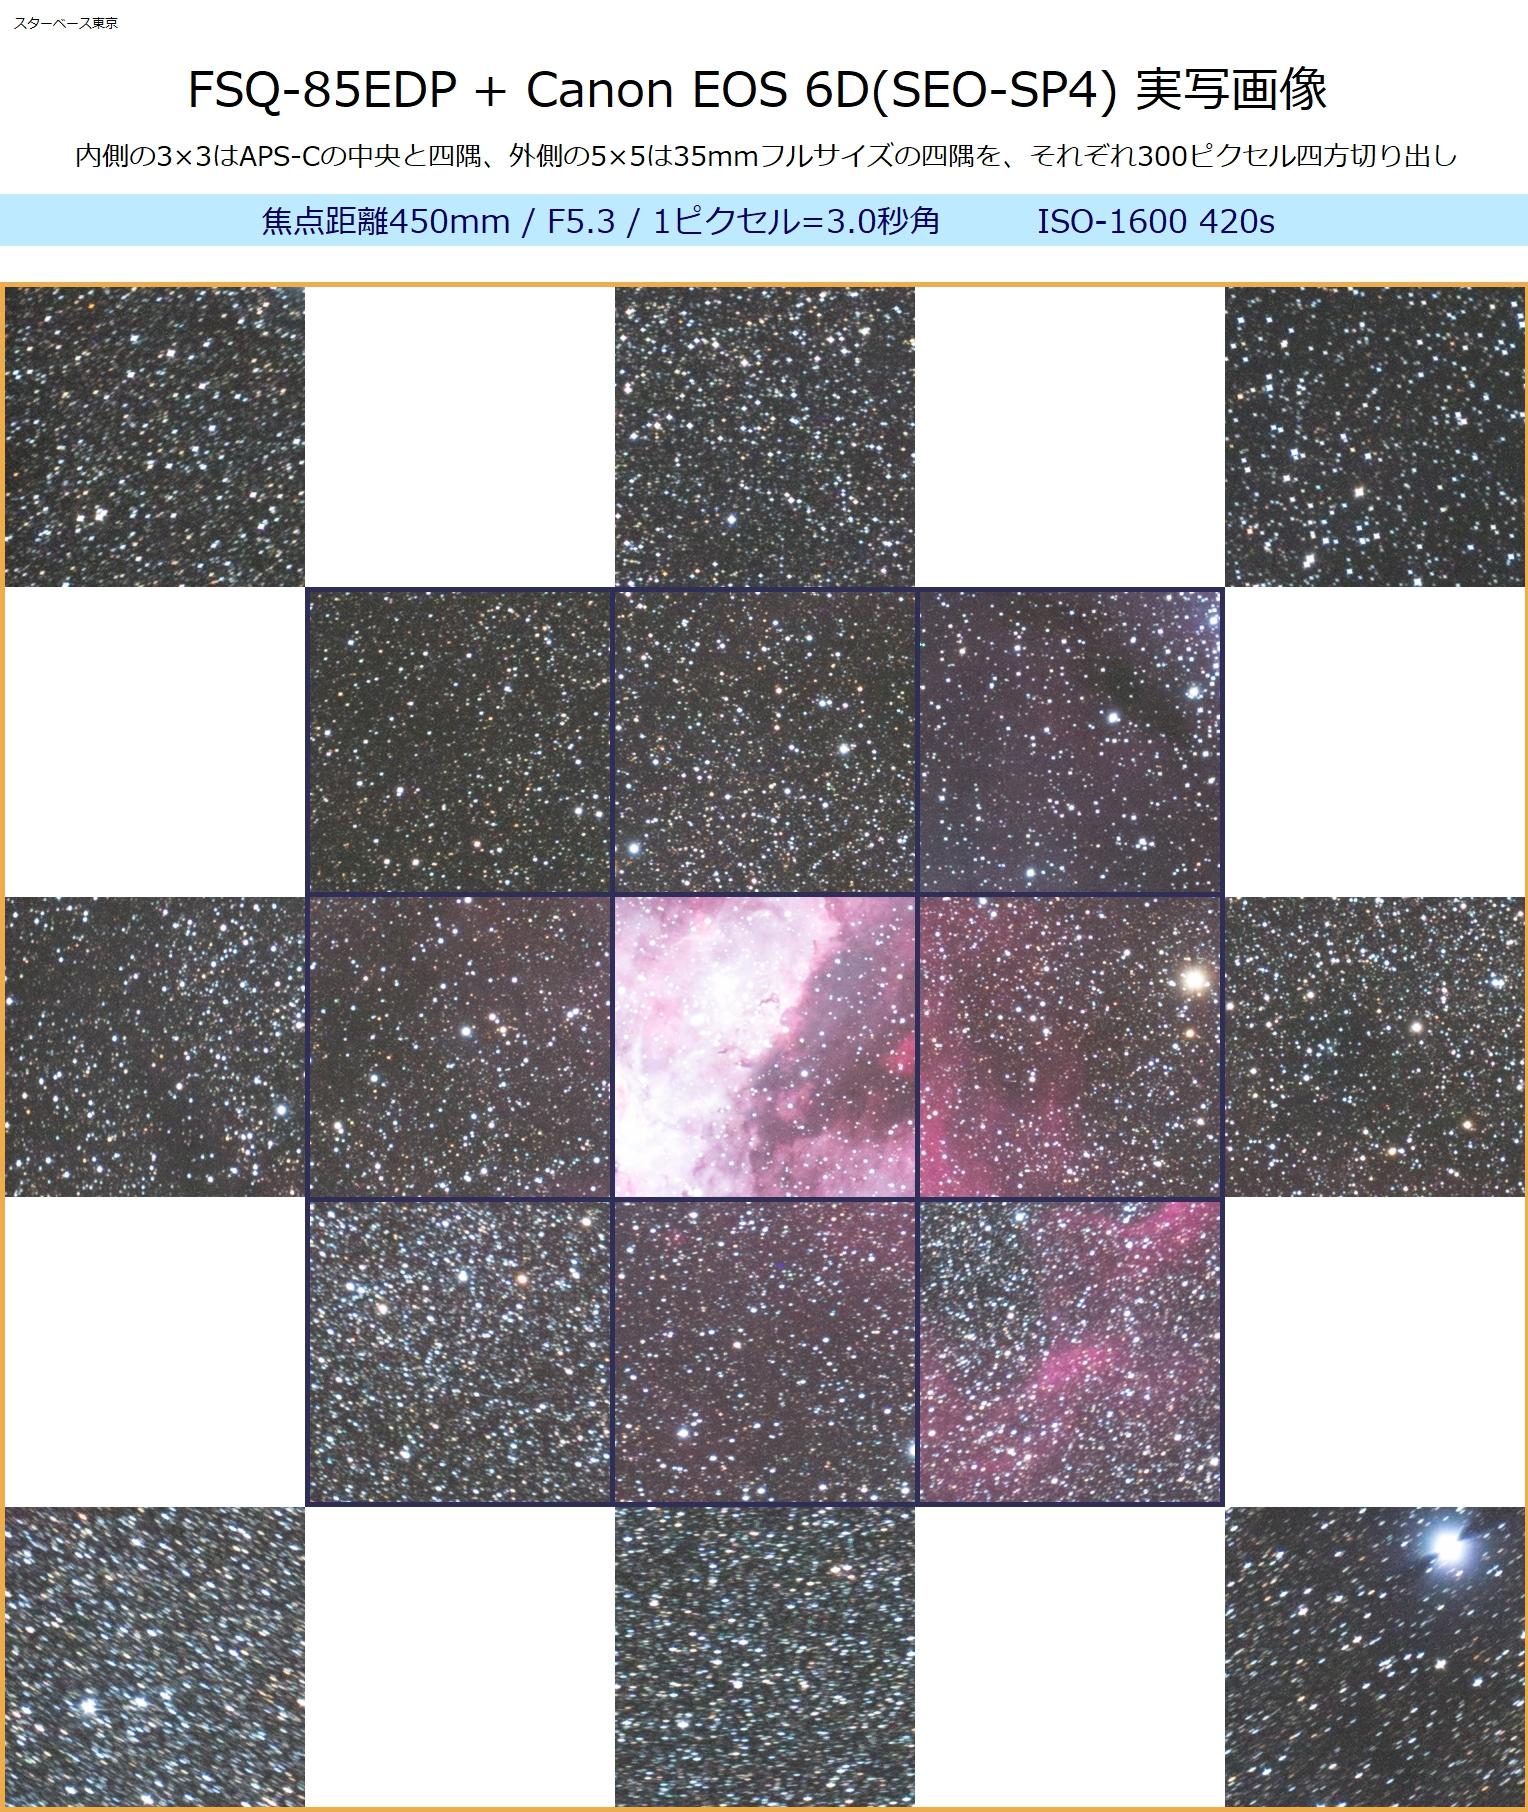 f:id:starbase:20180428123252j:plain